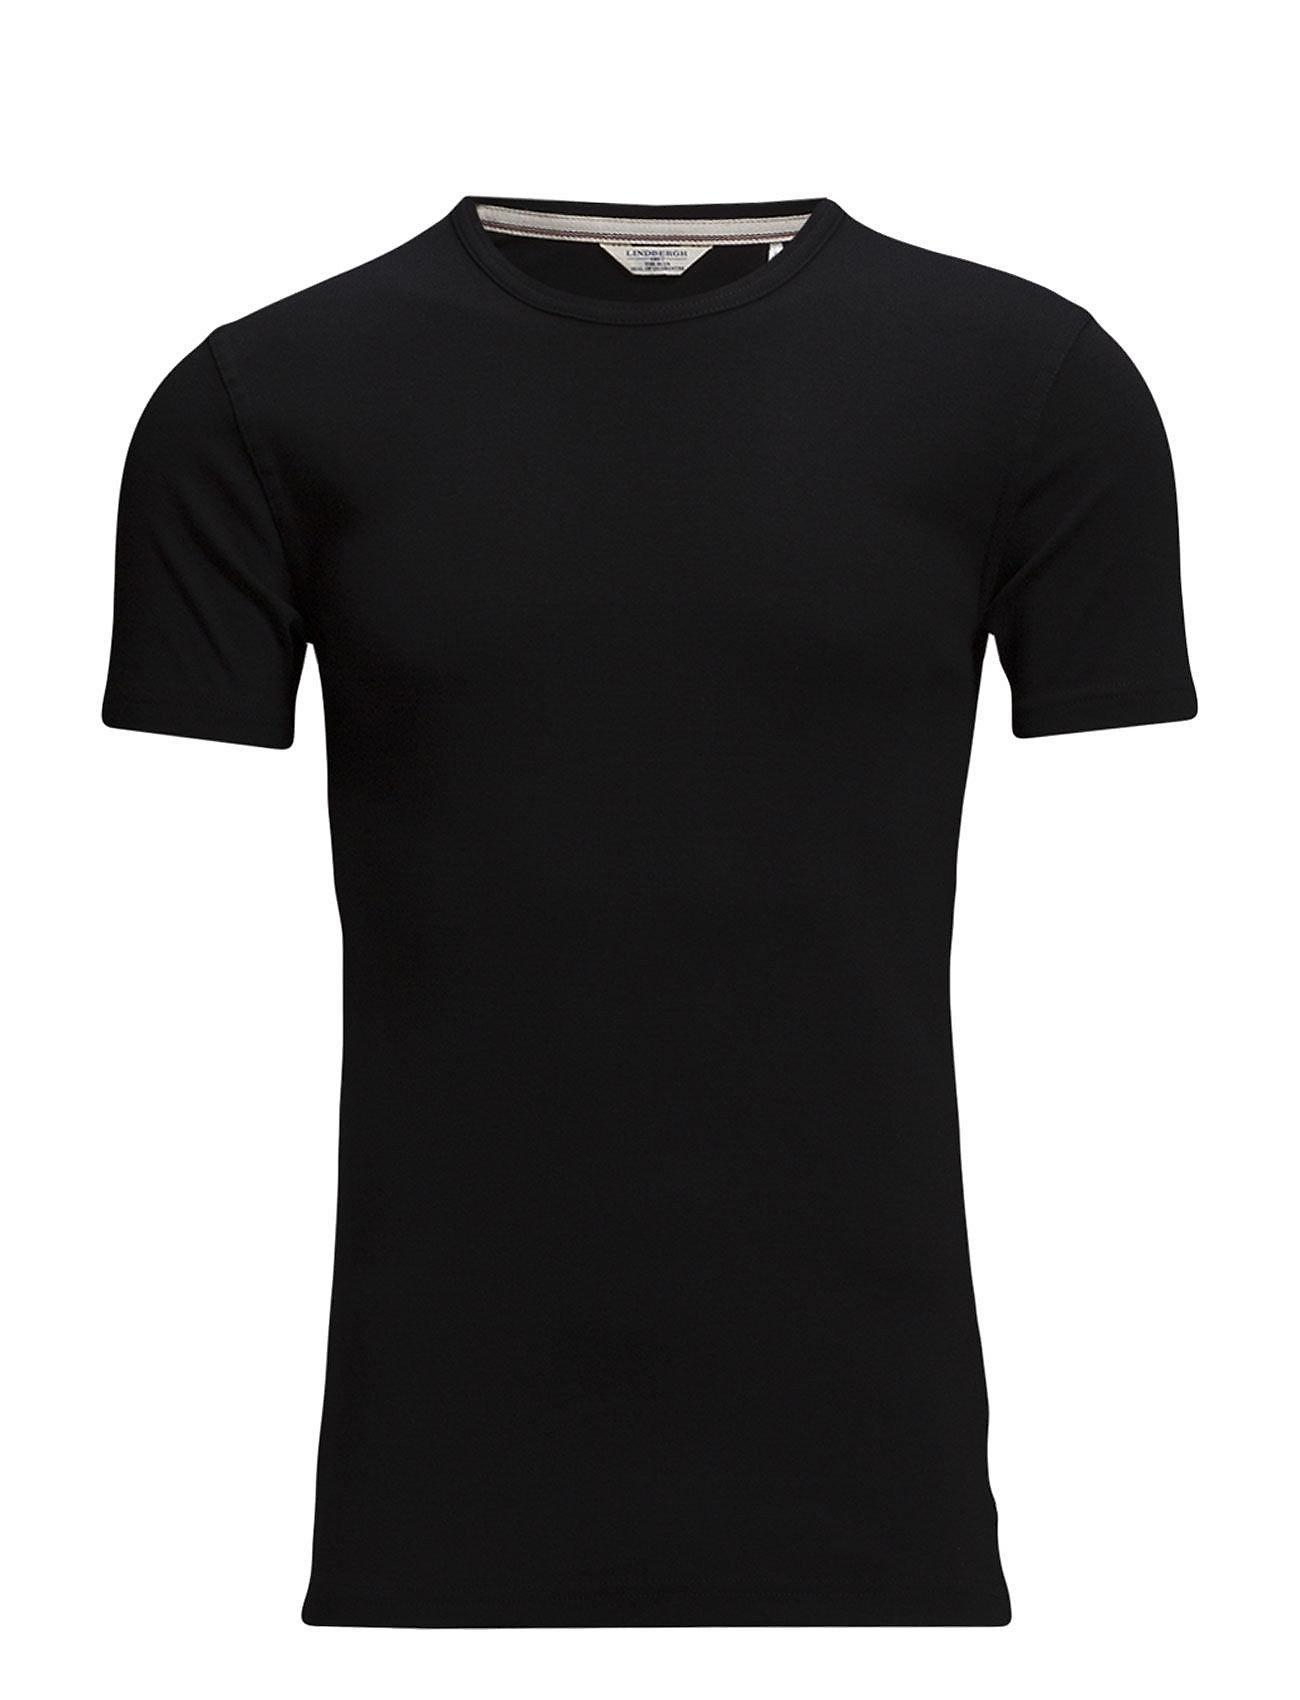 Lindbergh Basic t-shirt S/S - BLACK